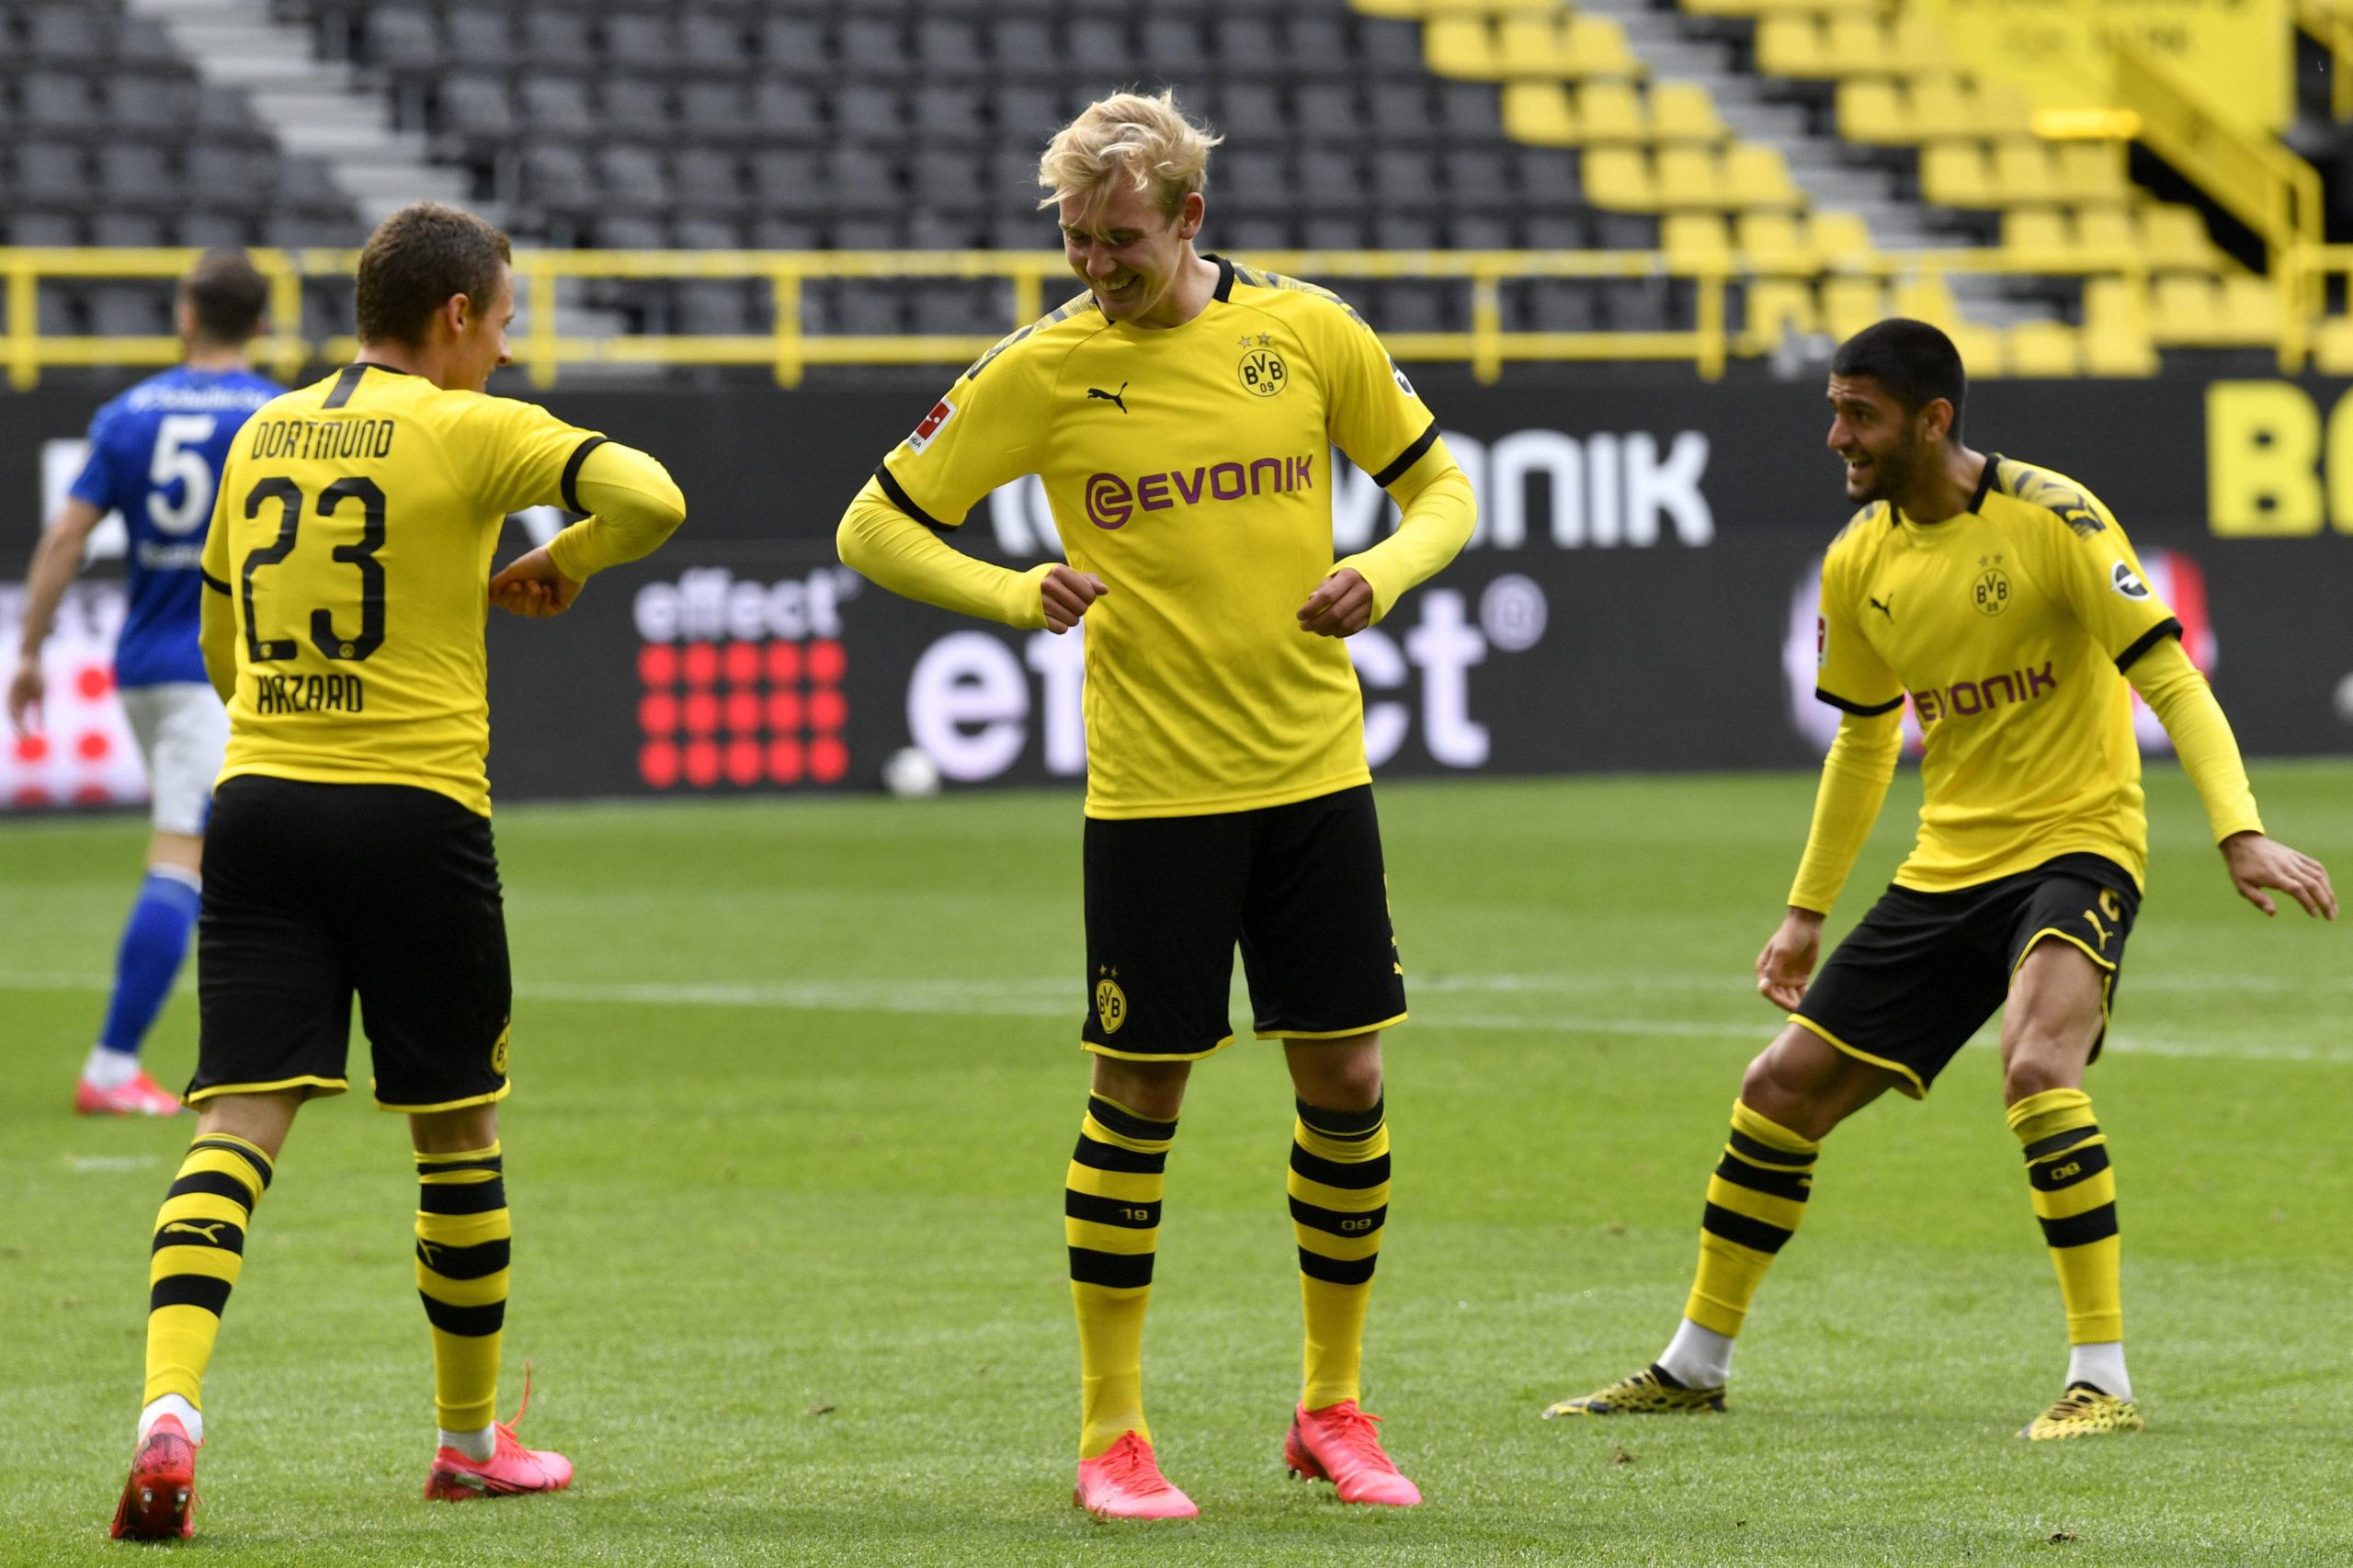 Dortmund's Thorgan Hazard, left, celebrates with Erling Haaland after scoring his side's third goal during the German Bundesliga soccer match between Borussia Dortmund and Schalke 04 in Dortmund, Germany.